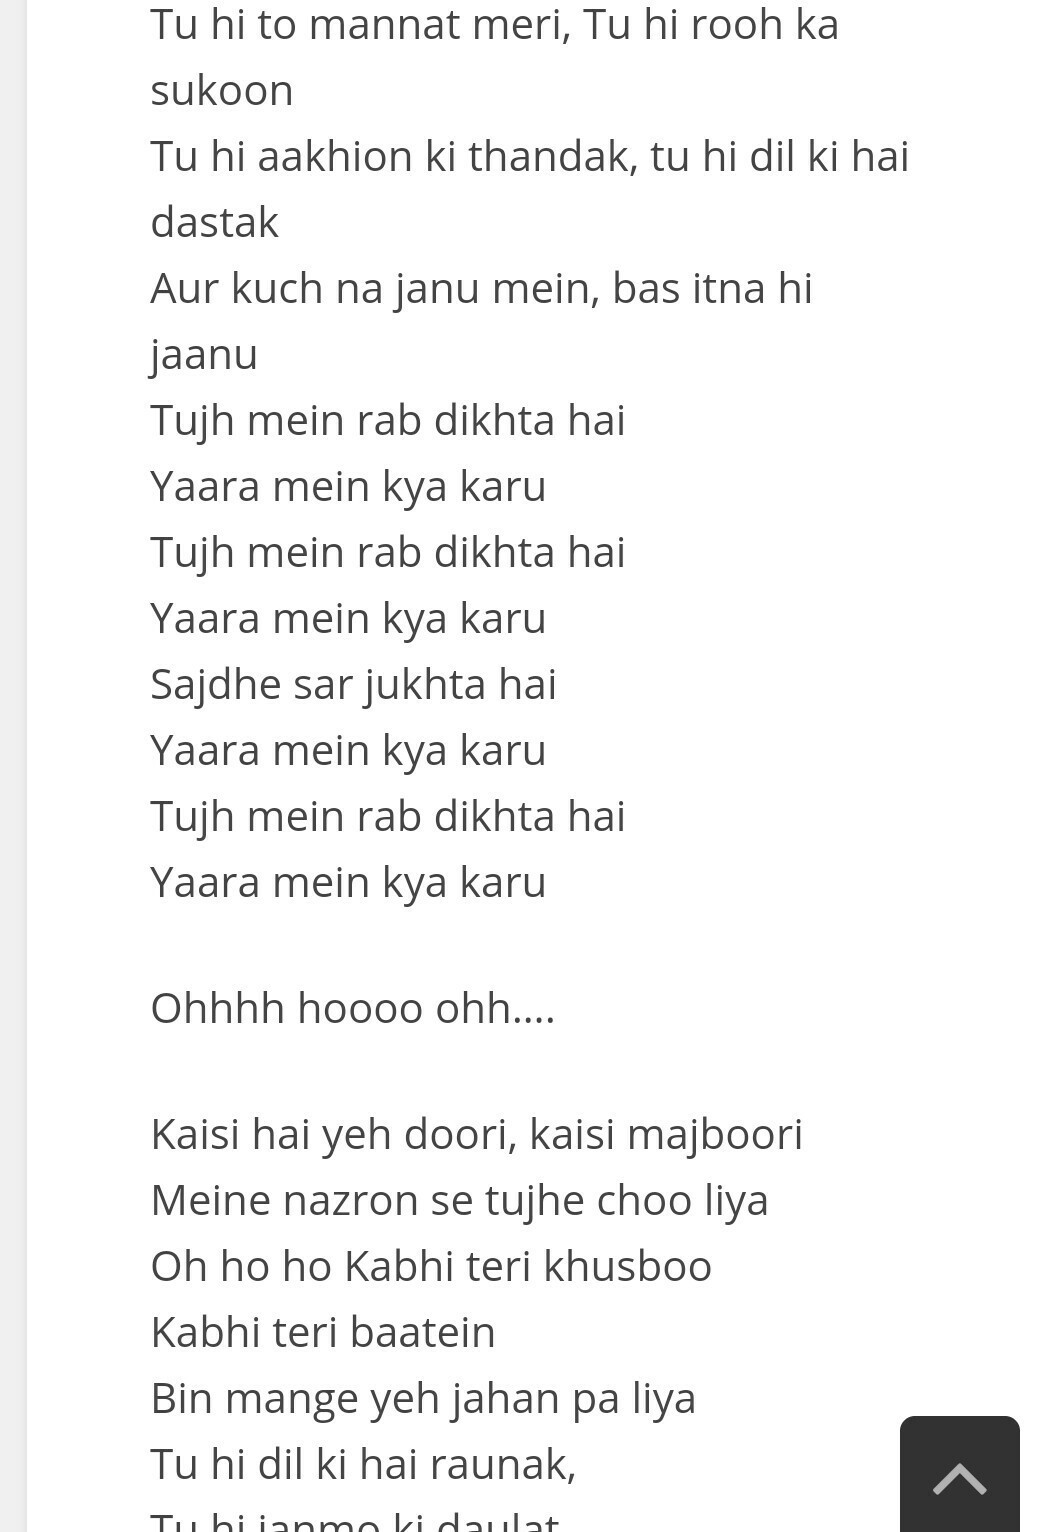 tujhme rab dikhta hai song download